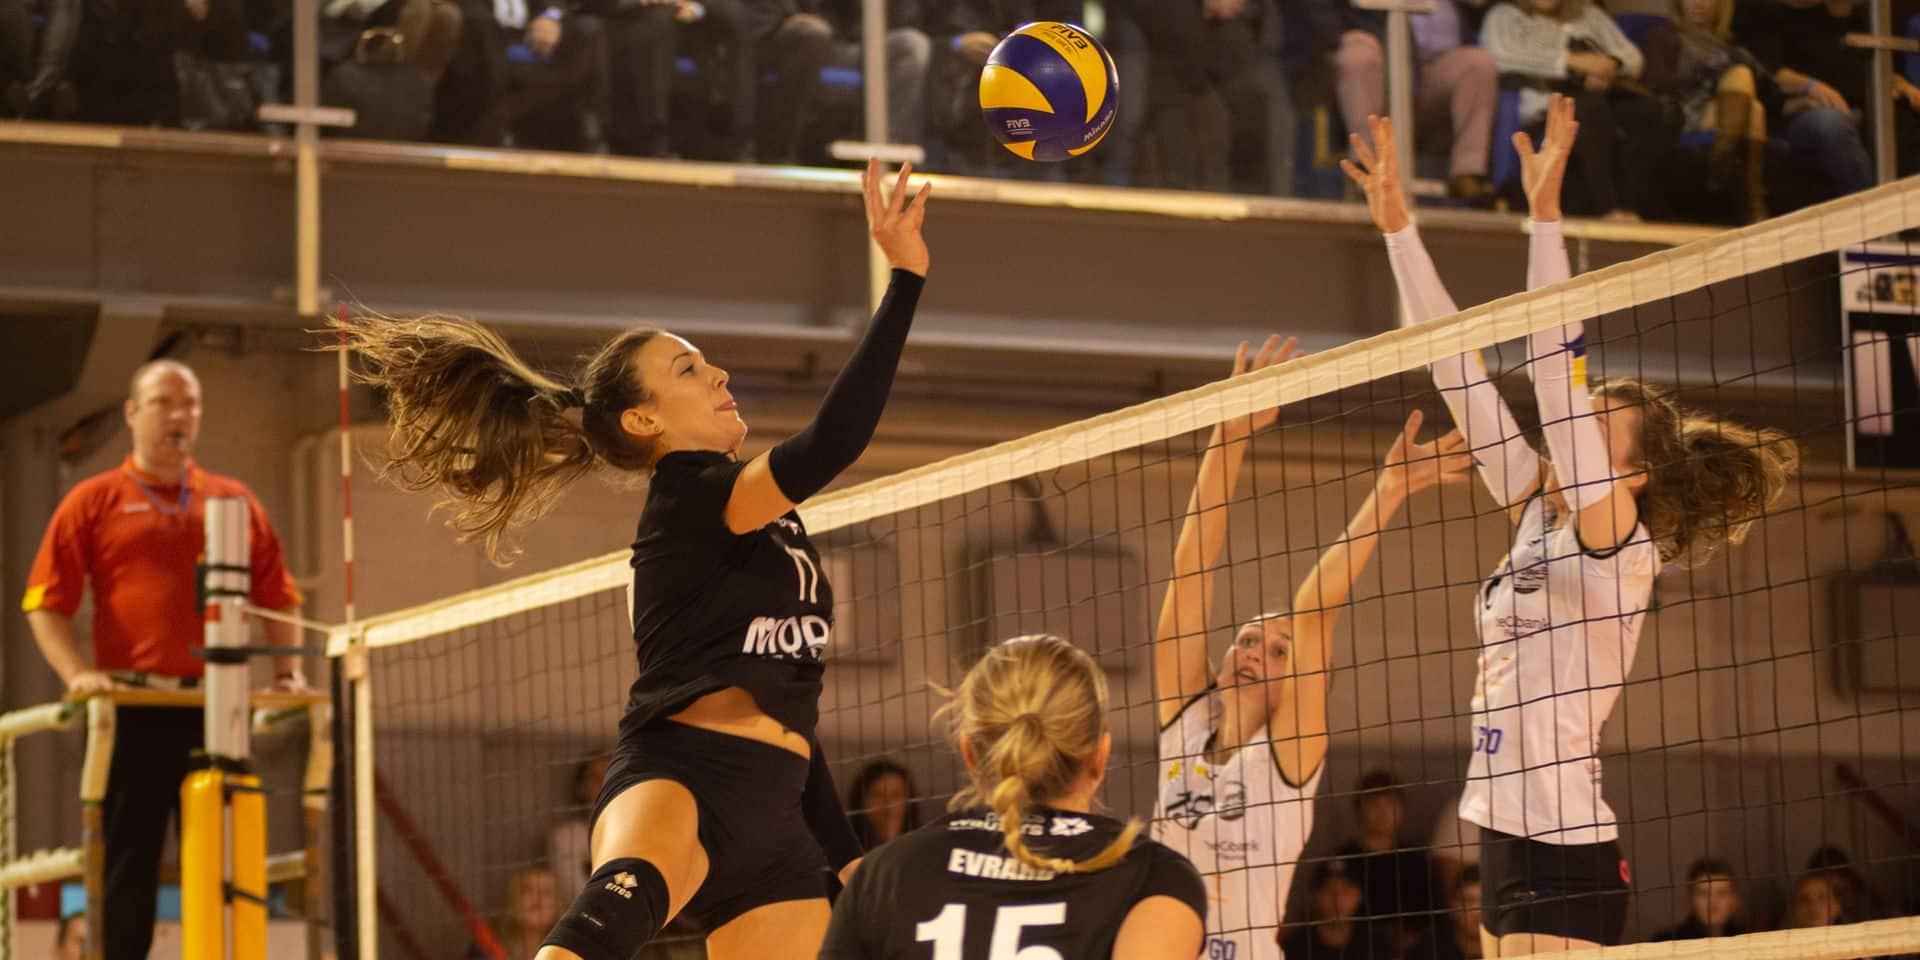 Charleroi Volley : Camille Hannaert rempile, Dorotea Cosic ne reviendra pas !